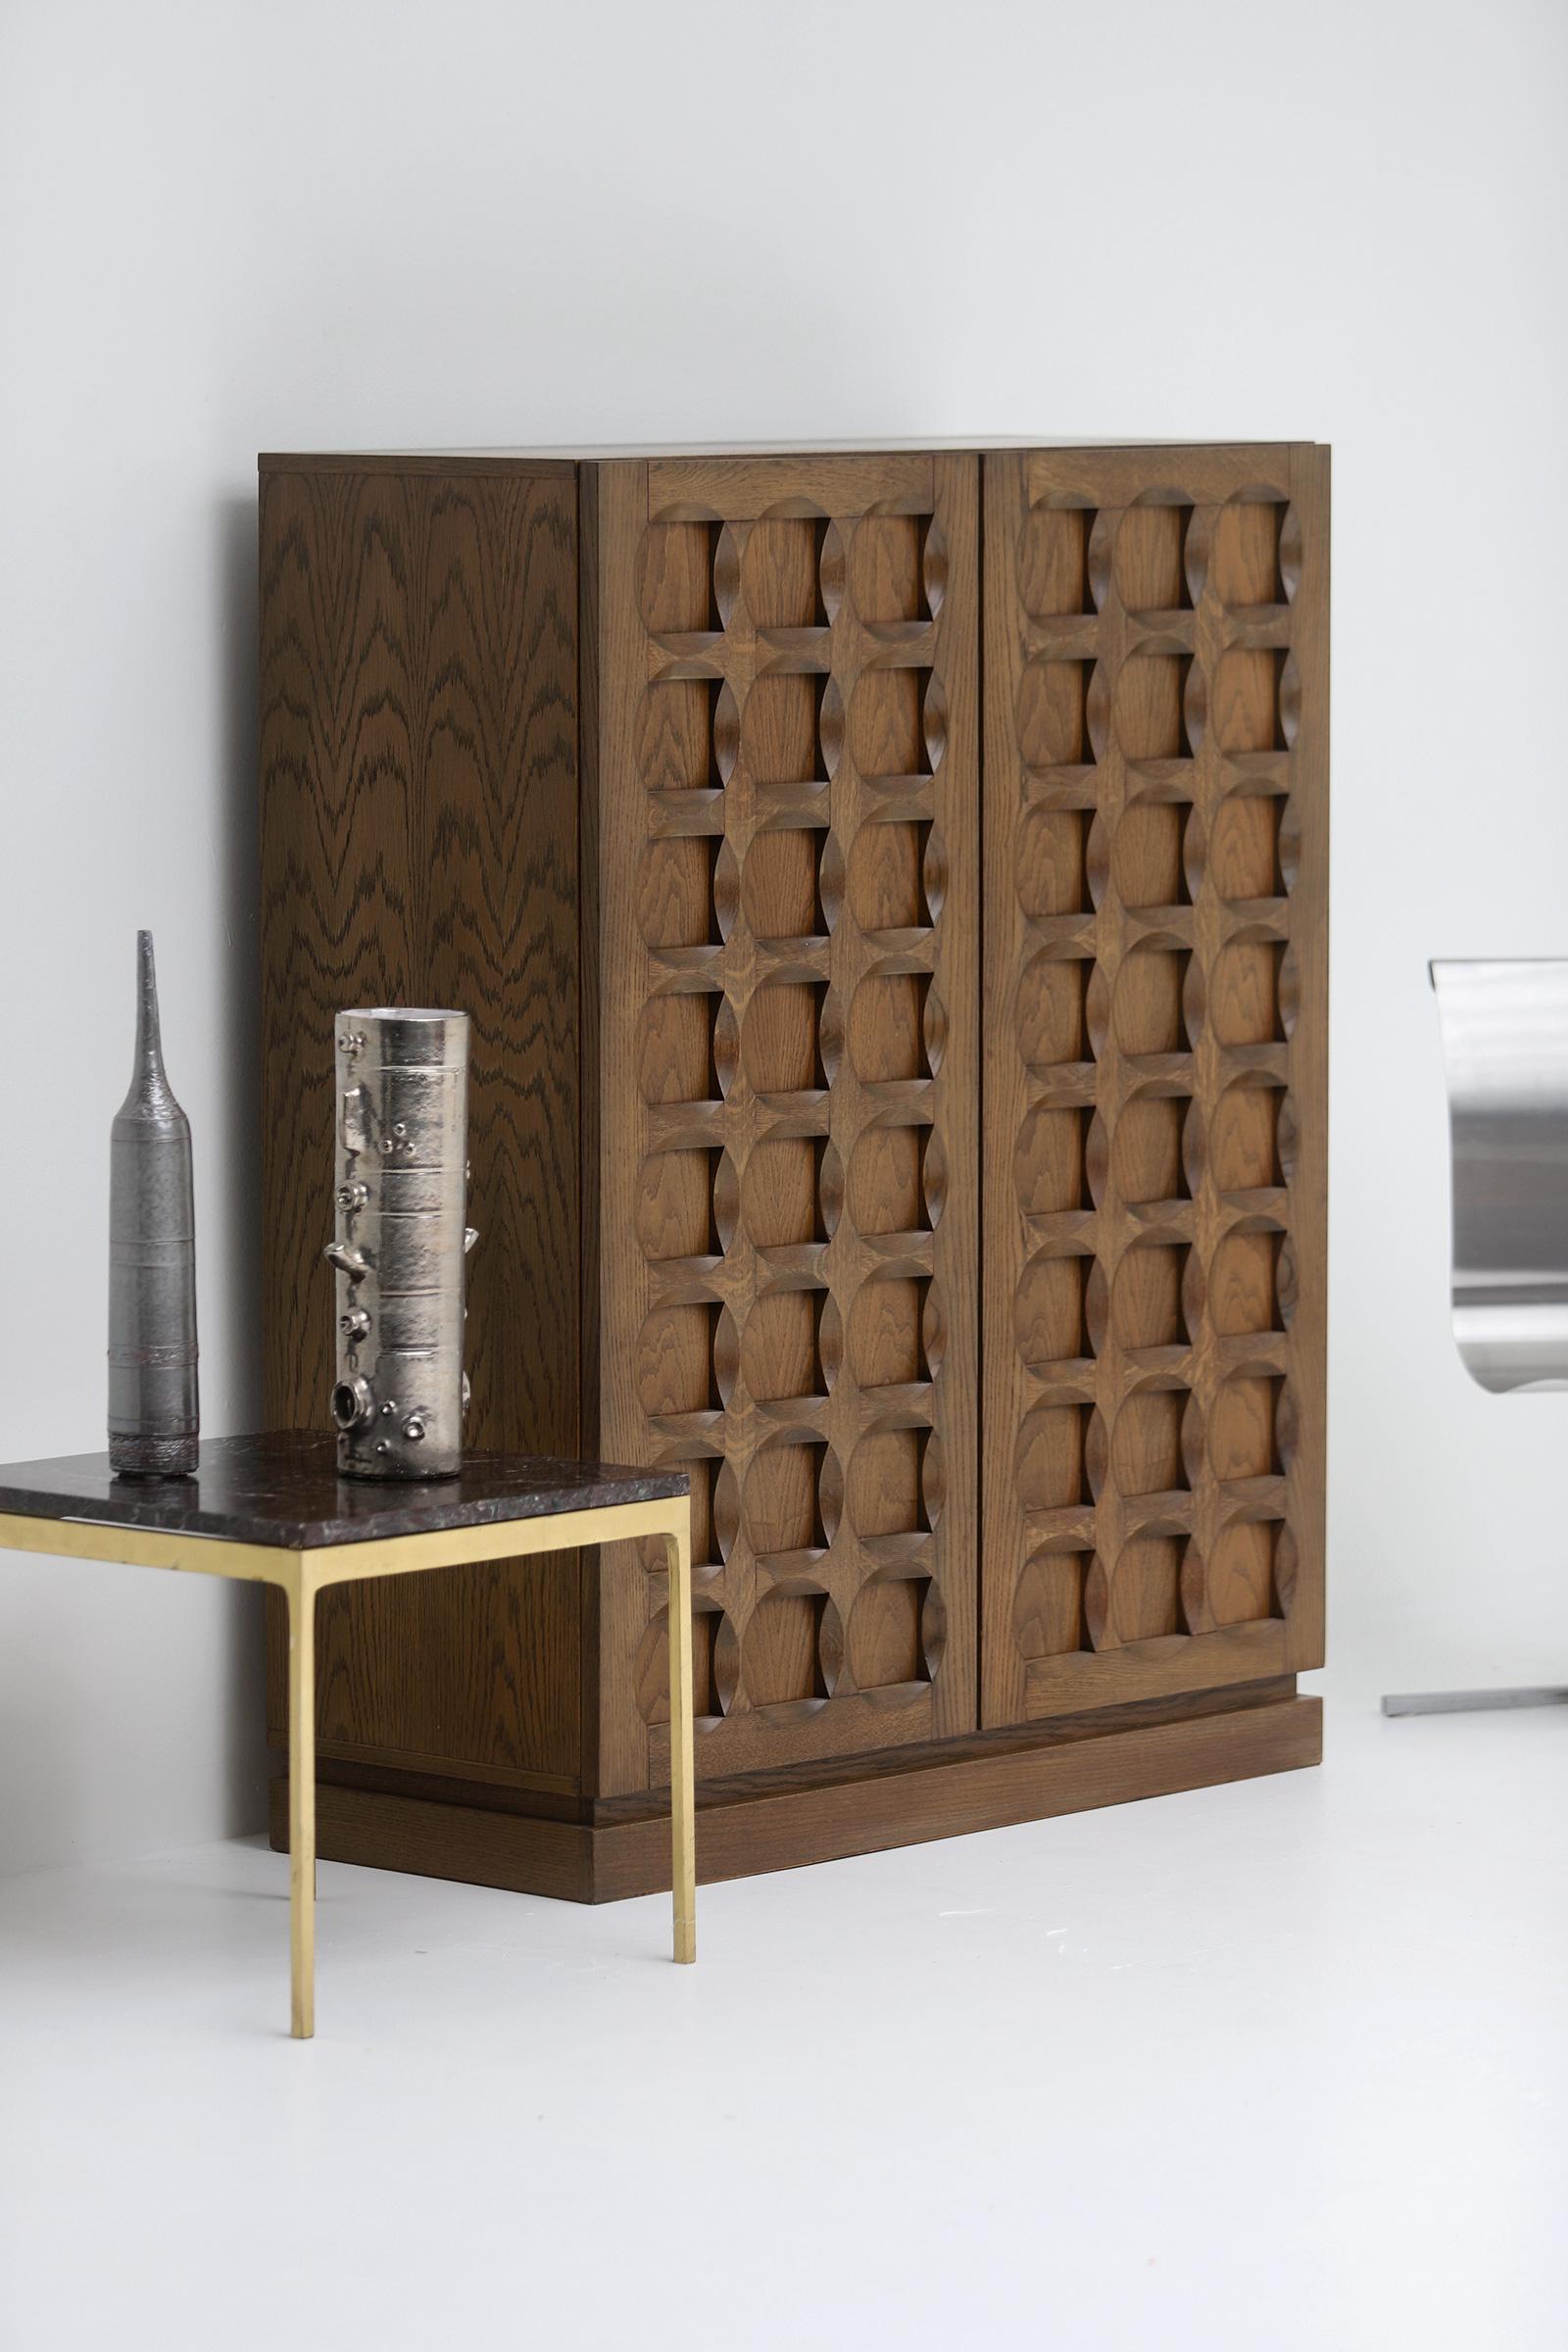 1970s Defour Cabinet Graphical Door Panels image 6